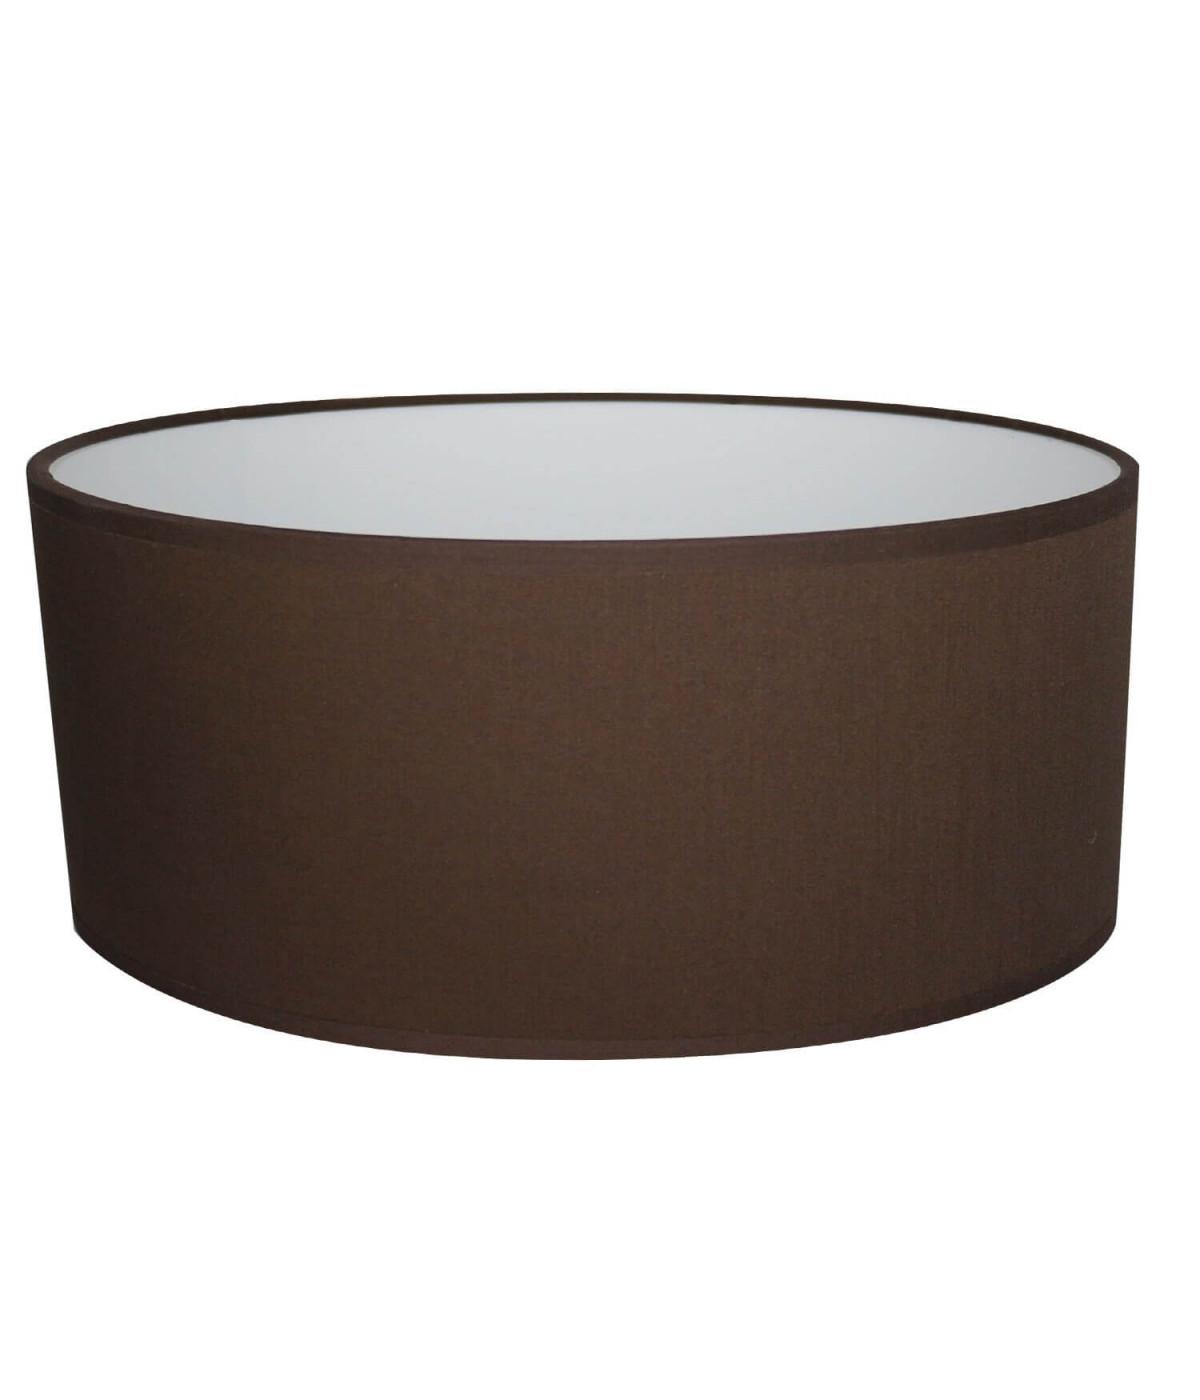 Abat-jour Oval Chocolat